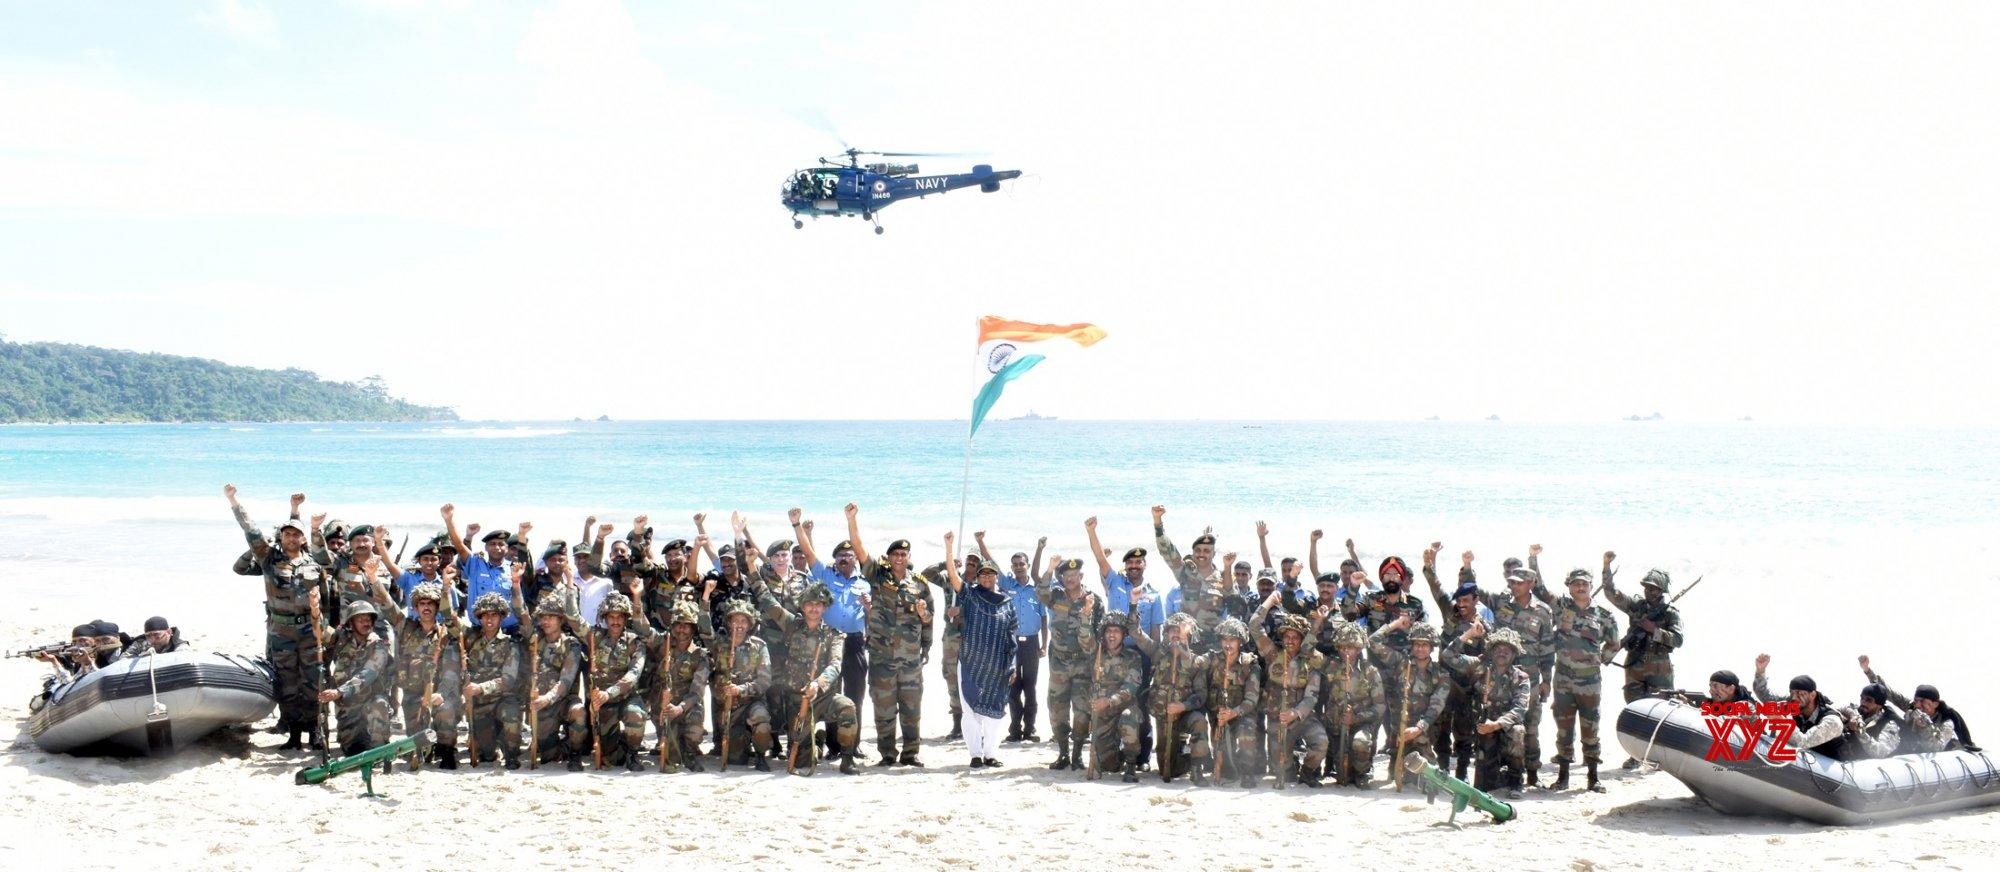 Port Blair: Nirmala Sitharaman with ANC troops #Gallery